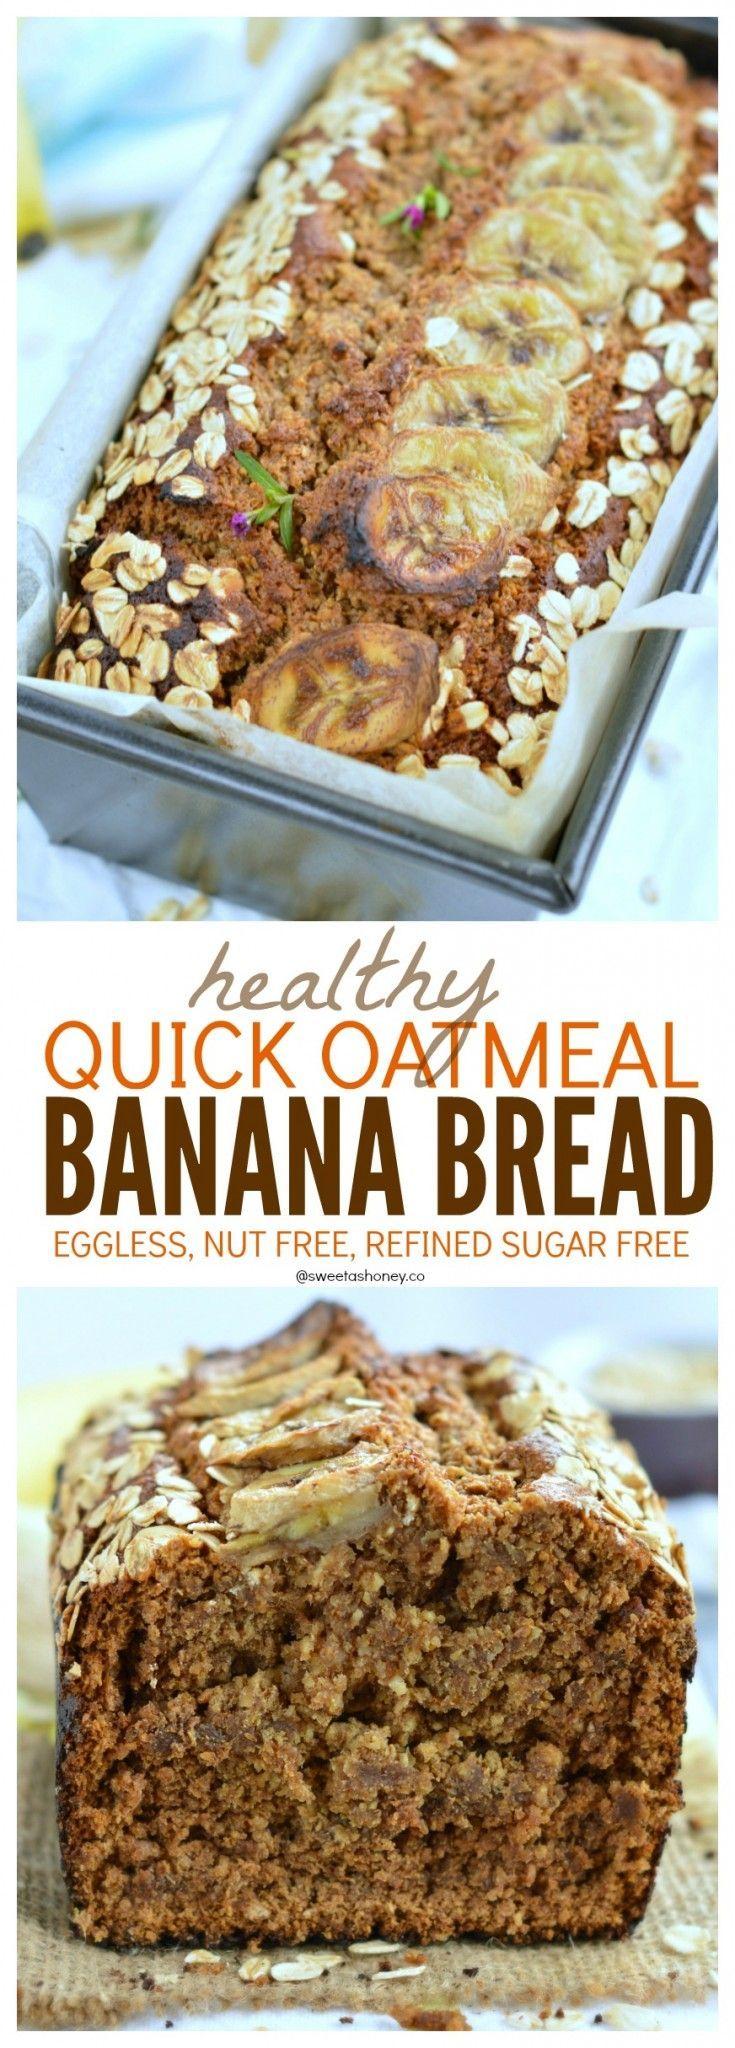 Oatmeal banana bread eggless banana bread recipe oatmeal oatmeal banana bread eggless banana bread forumfinder Image collections